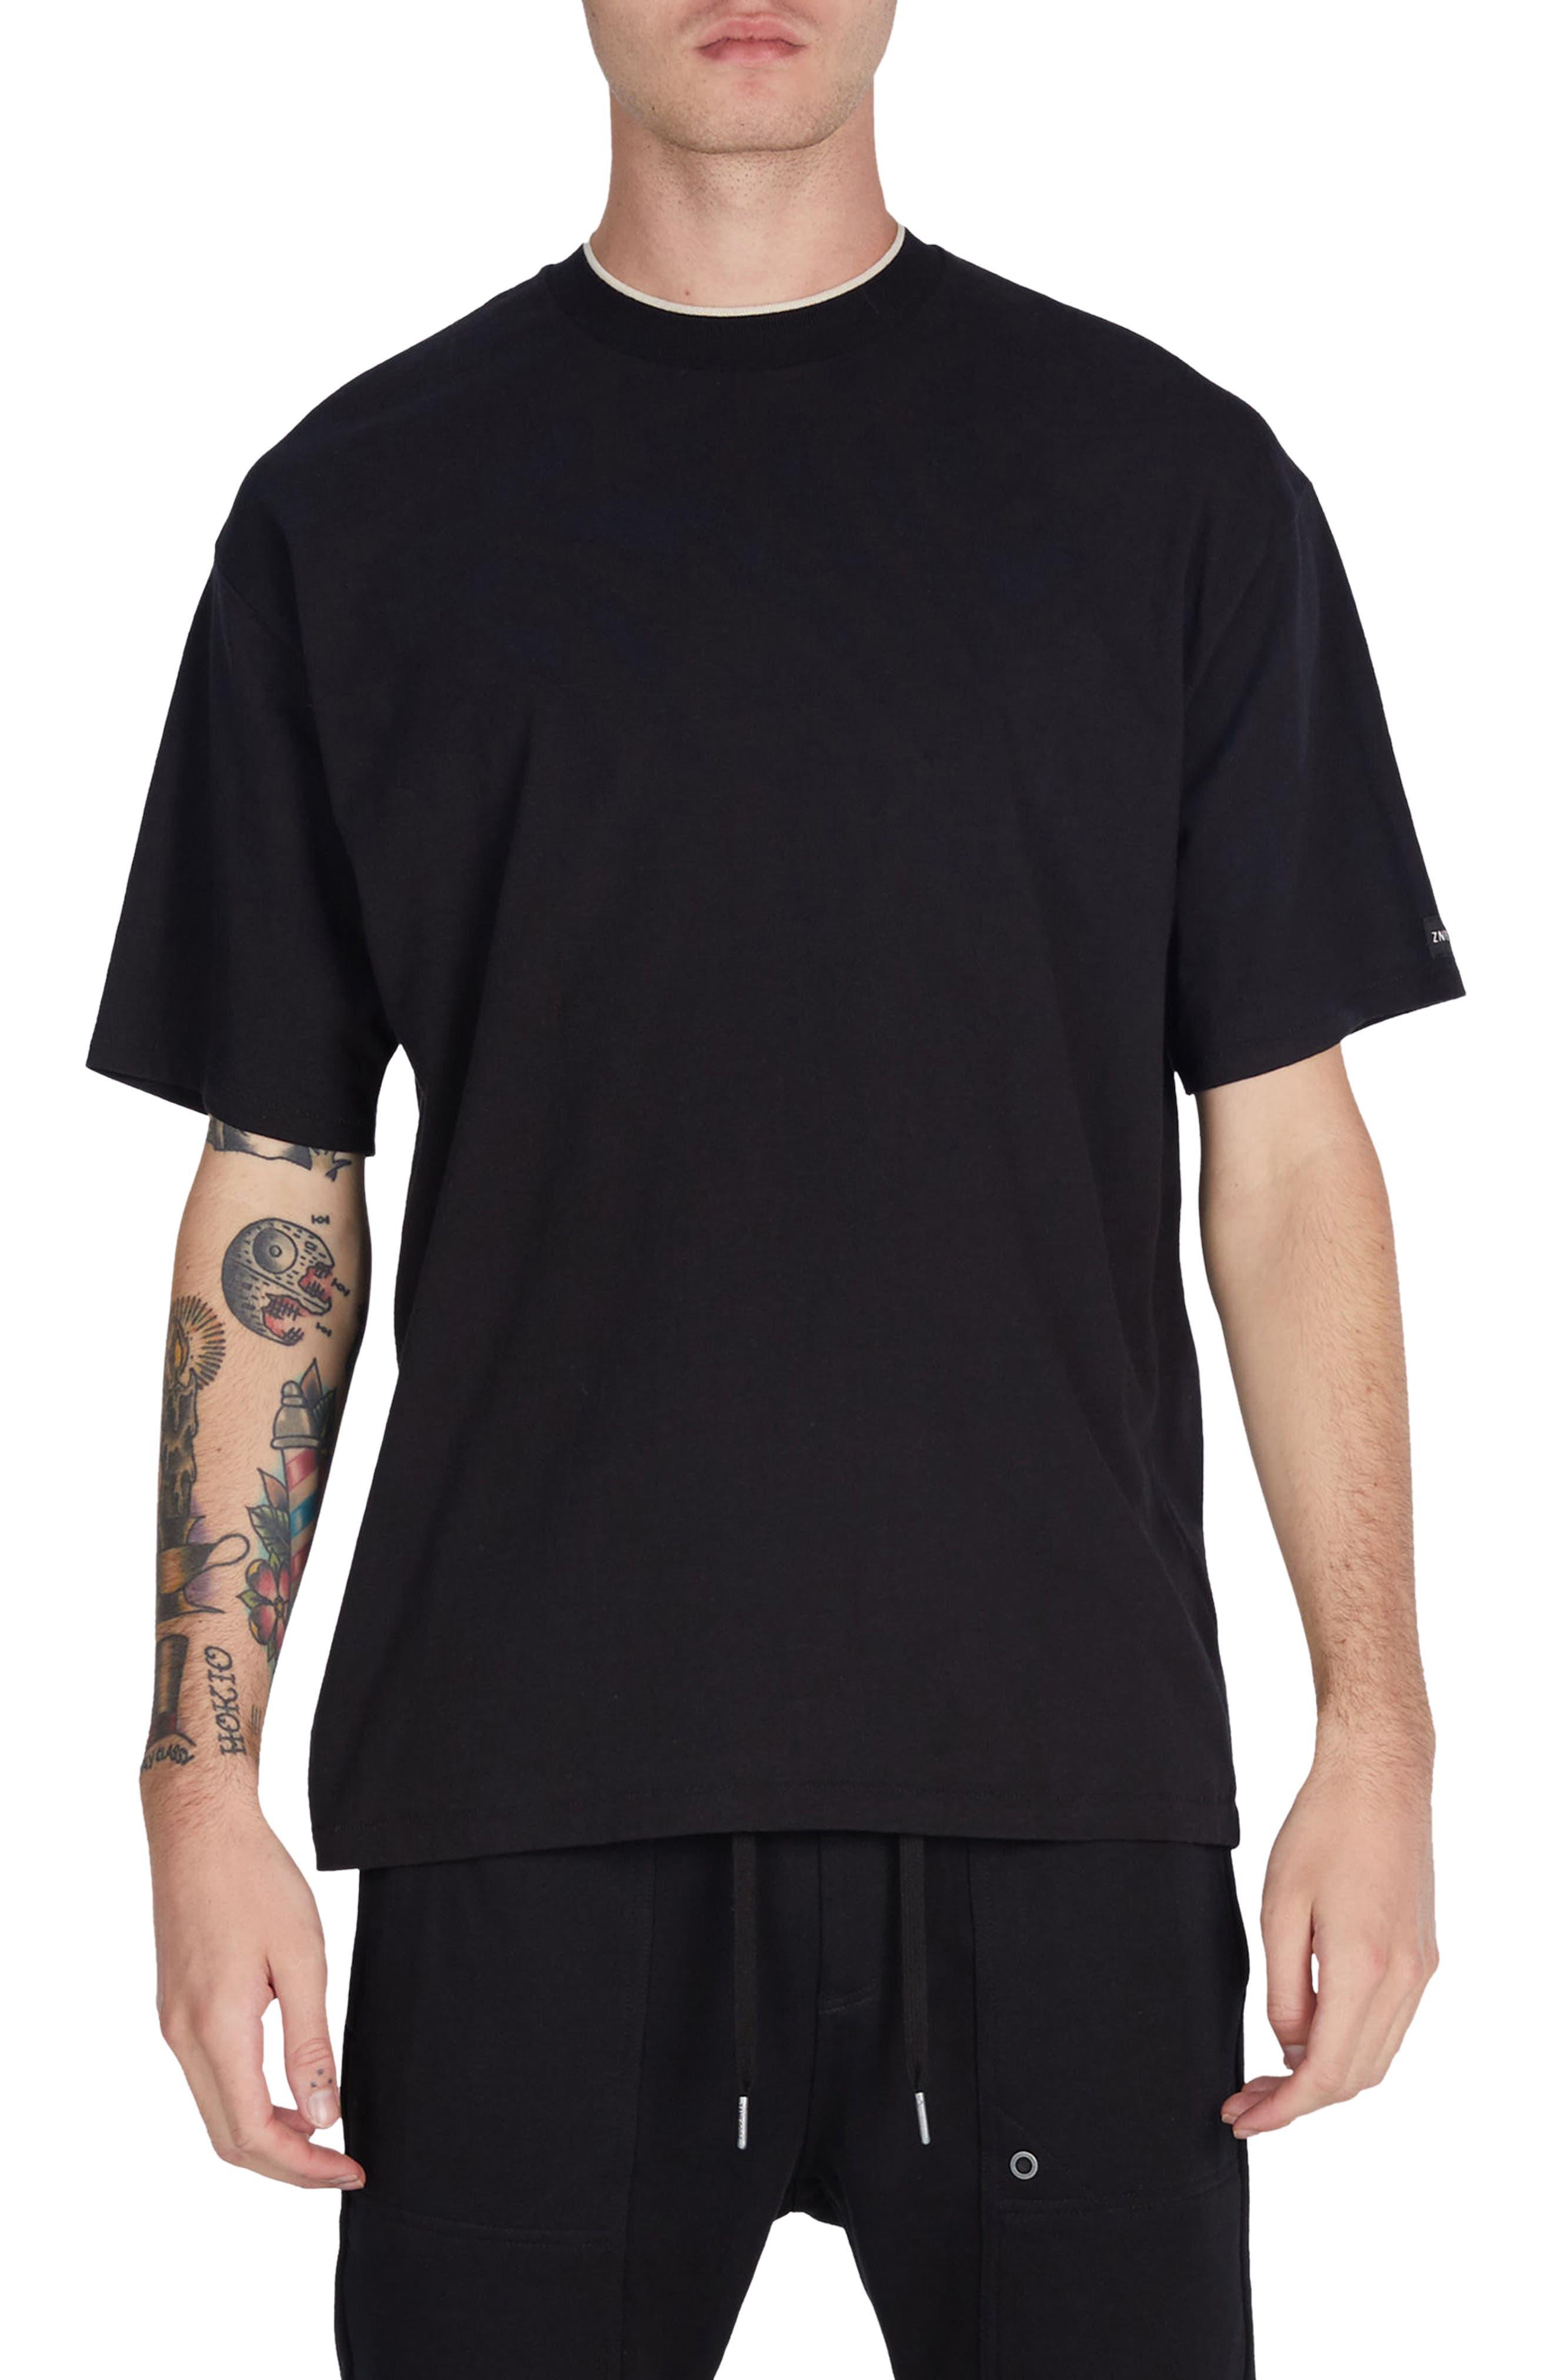 Tip Box T-Shirt,                         Main,                         color, Black